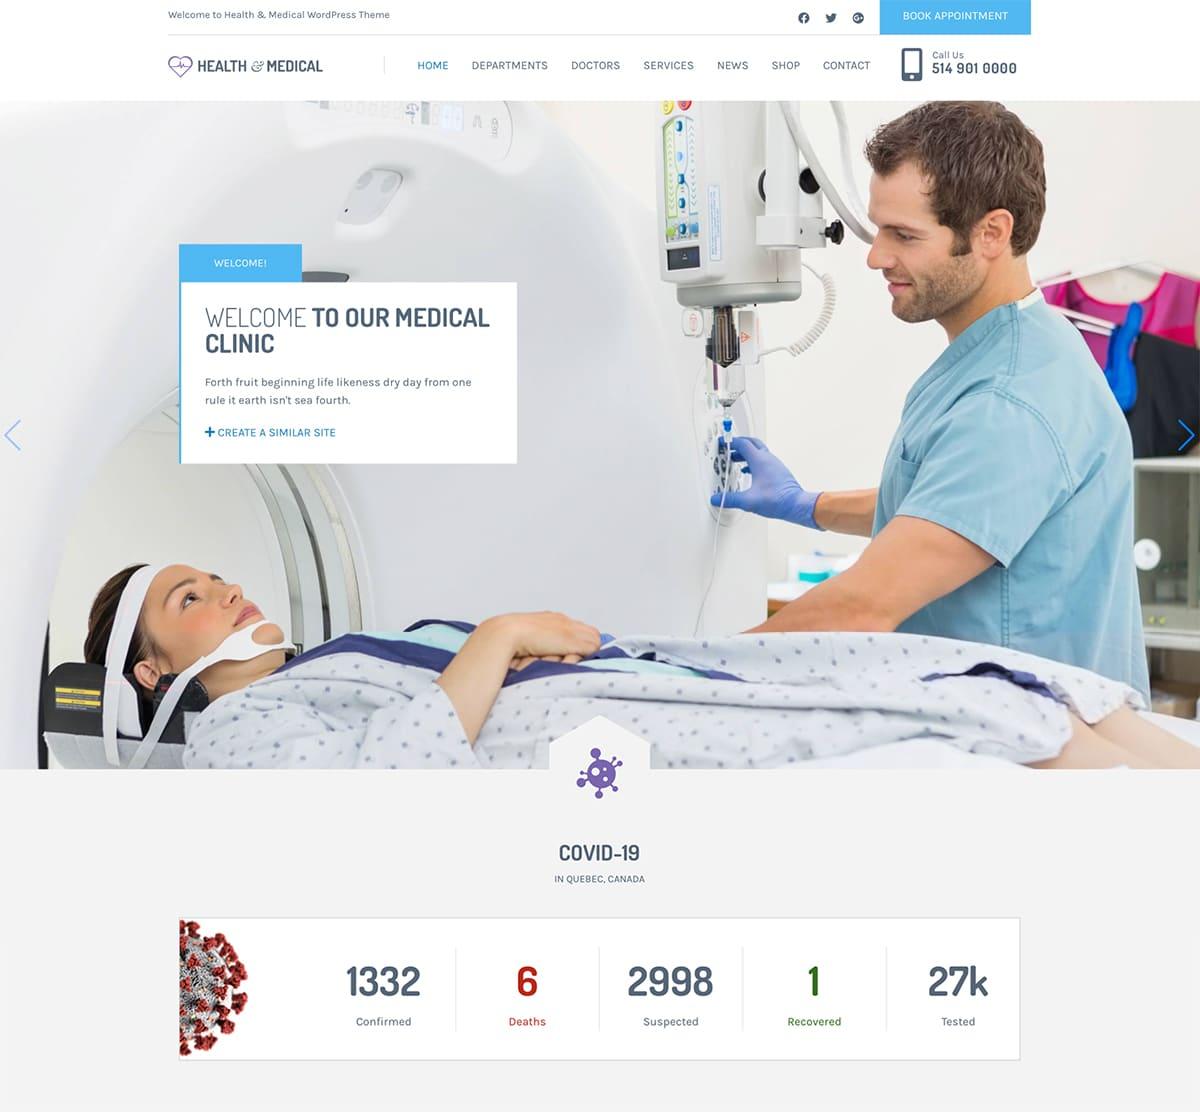 Health & Medical WordPress Theme